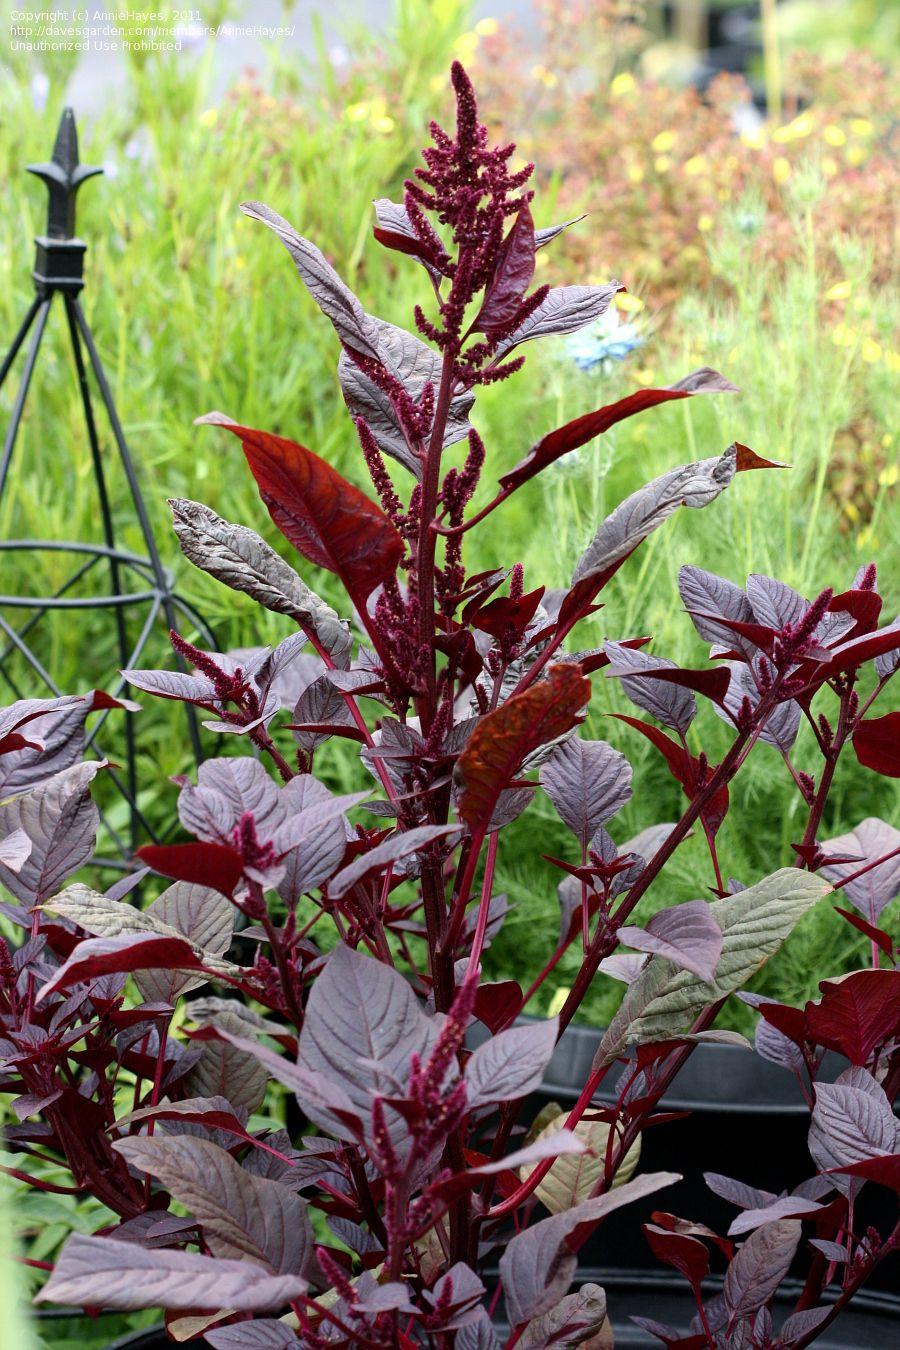 Plantfiles Pictures Purple Amaranth Red Amaranth Prince S Feather Mexican Grain Amaranth Hopi Red Dye Amaranthus Cruent Amaranthus Amaranth Plant Plants